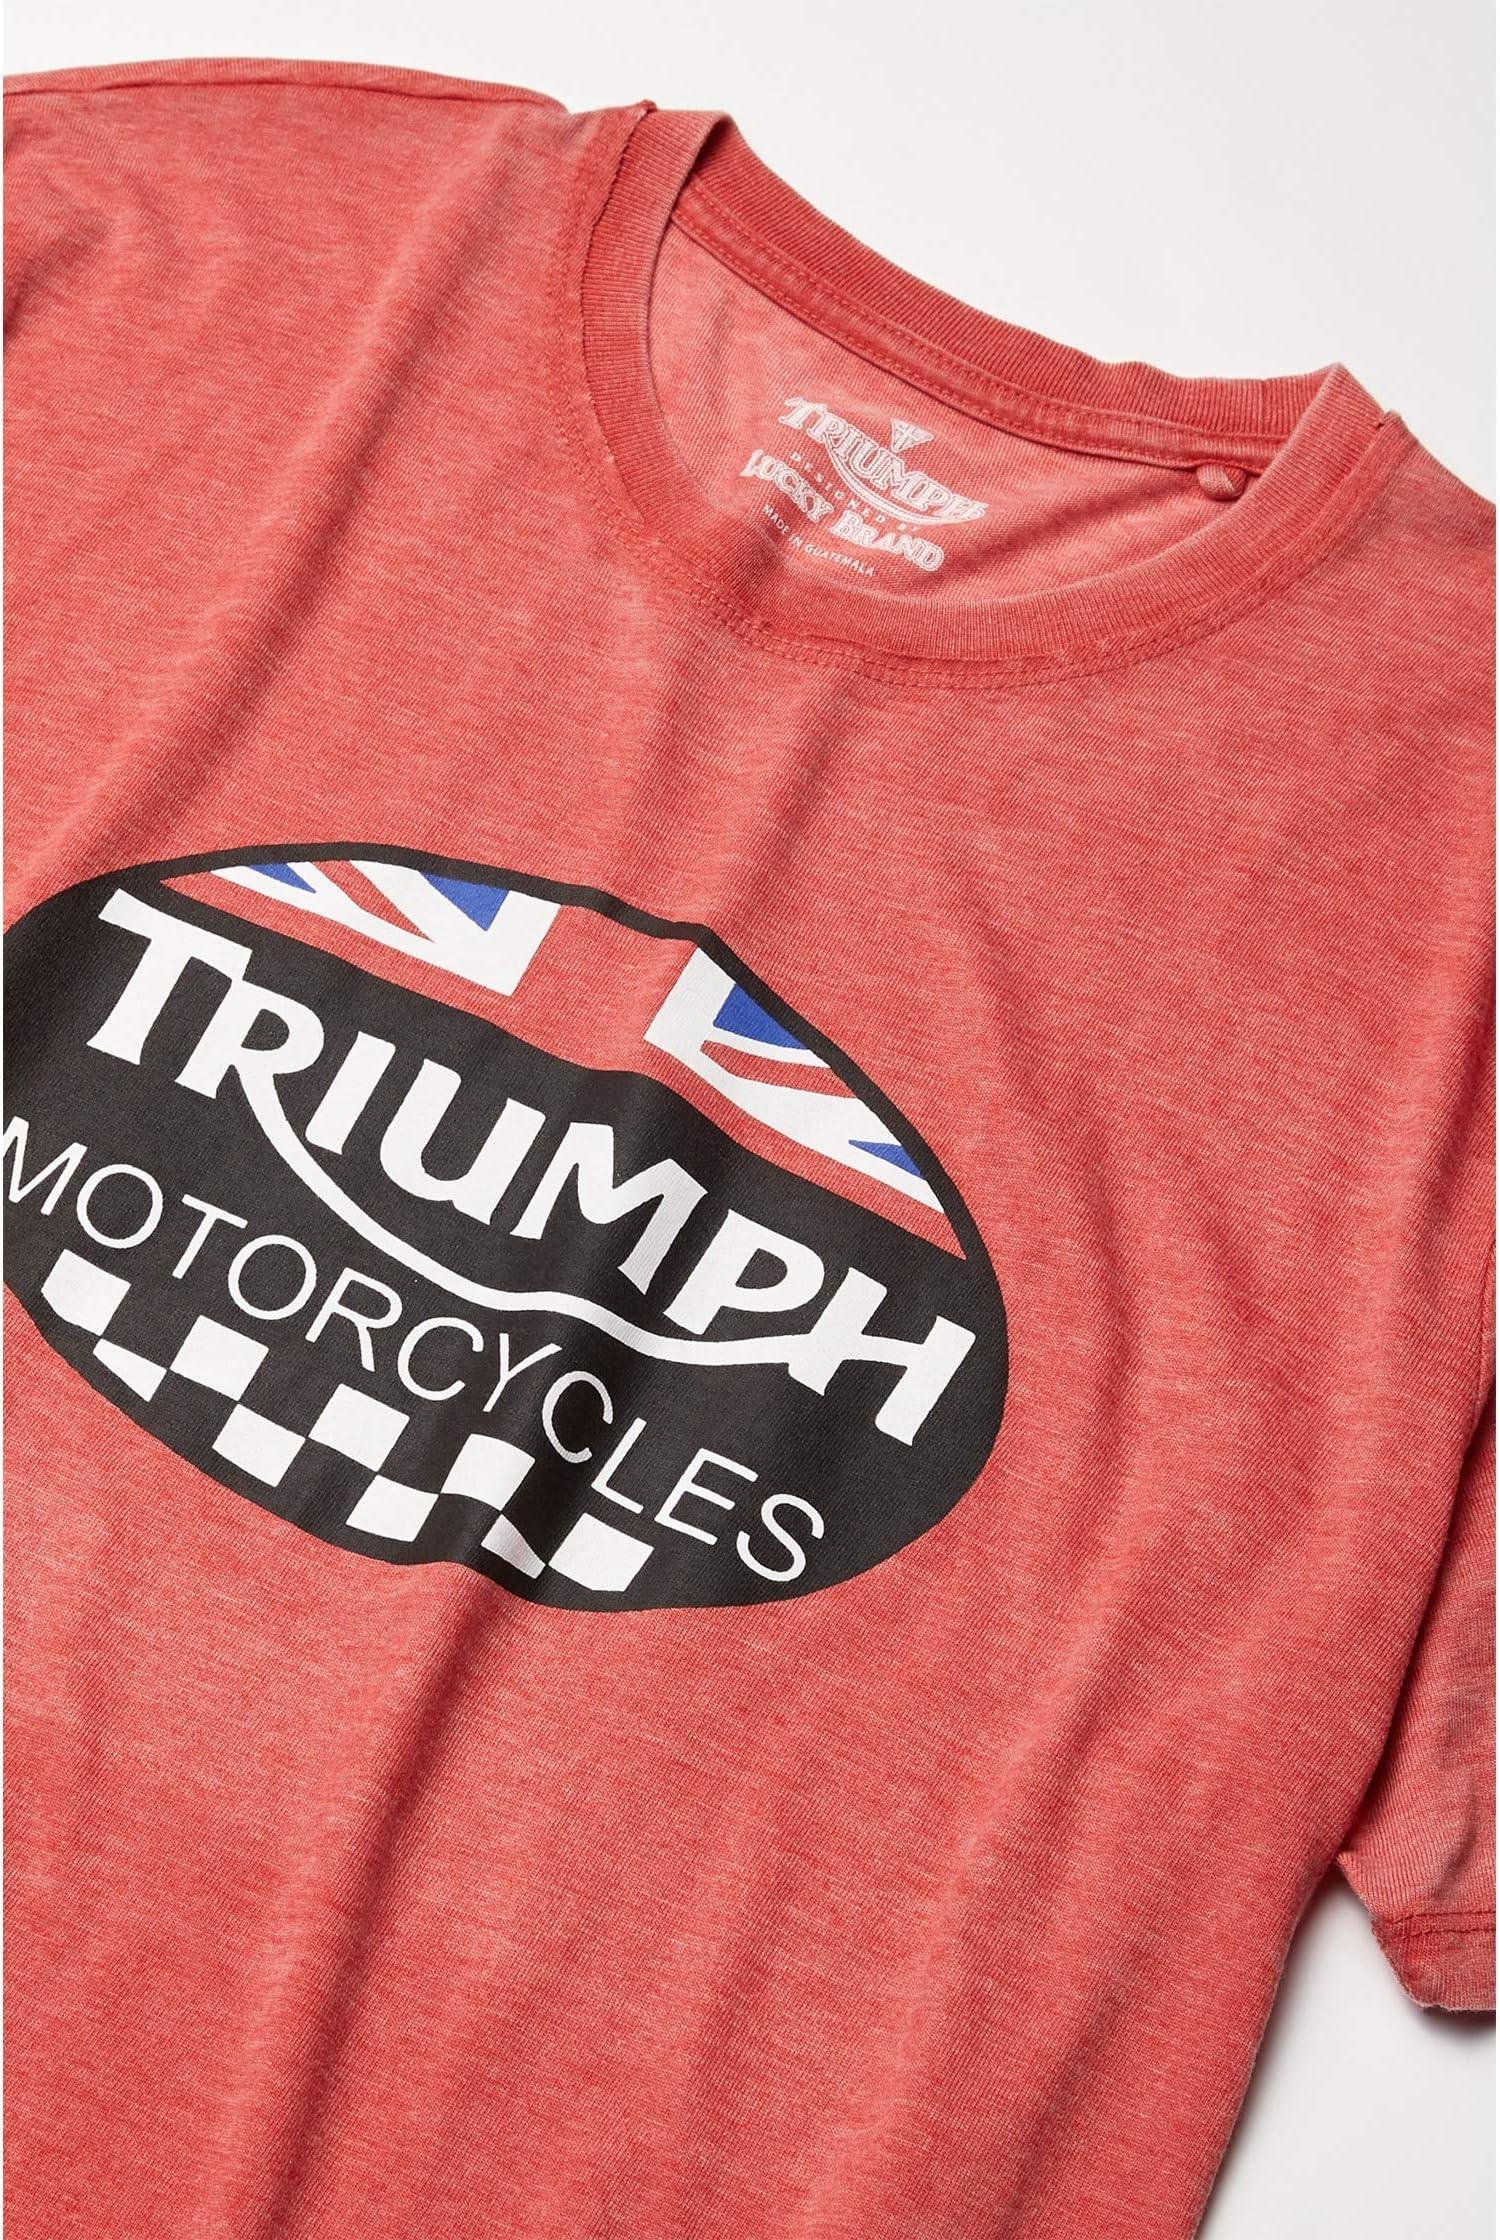 Lucky Brand Triumph Tee cuXwO